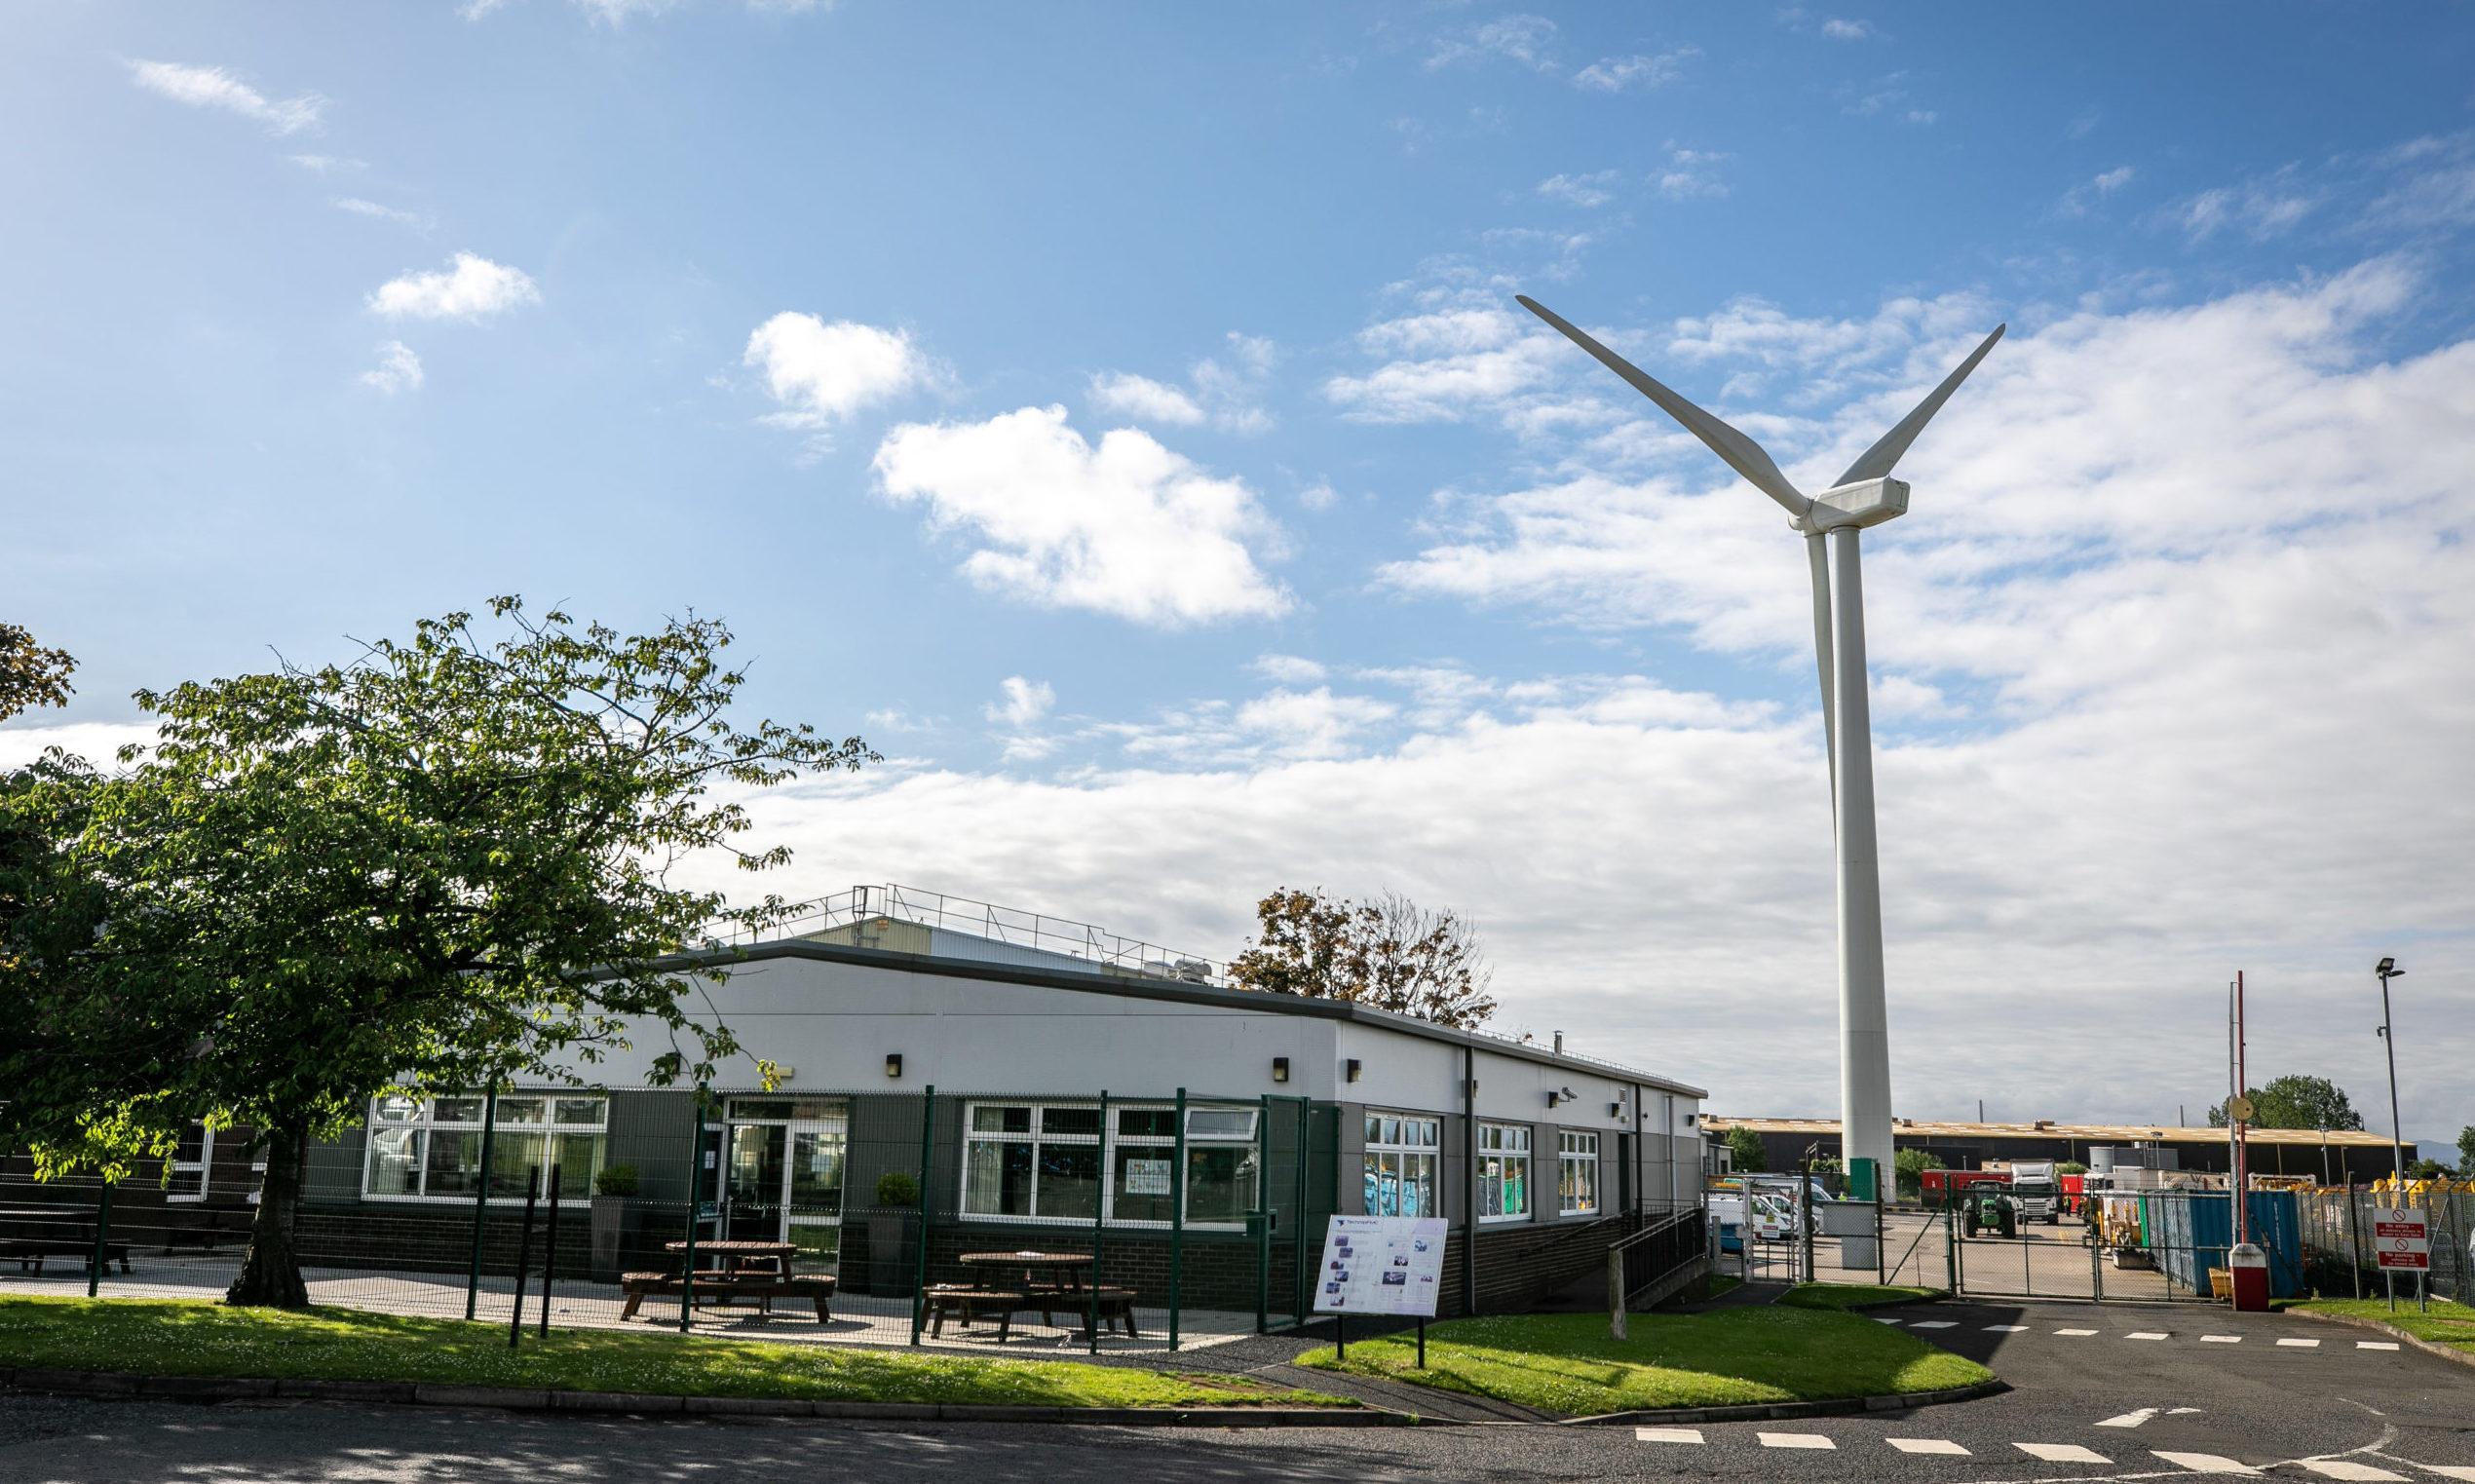 Technip FMC premises in Dunfermline.